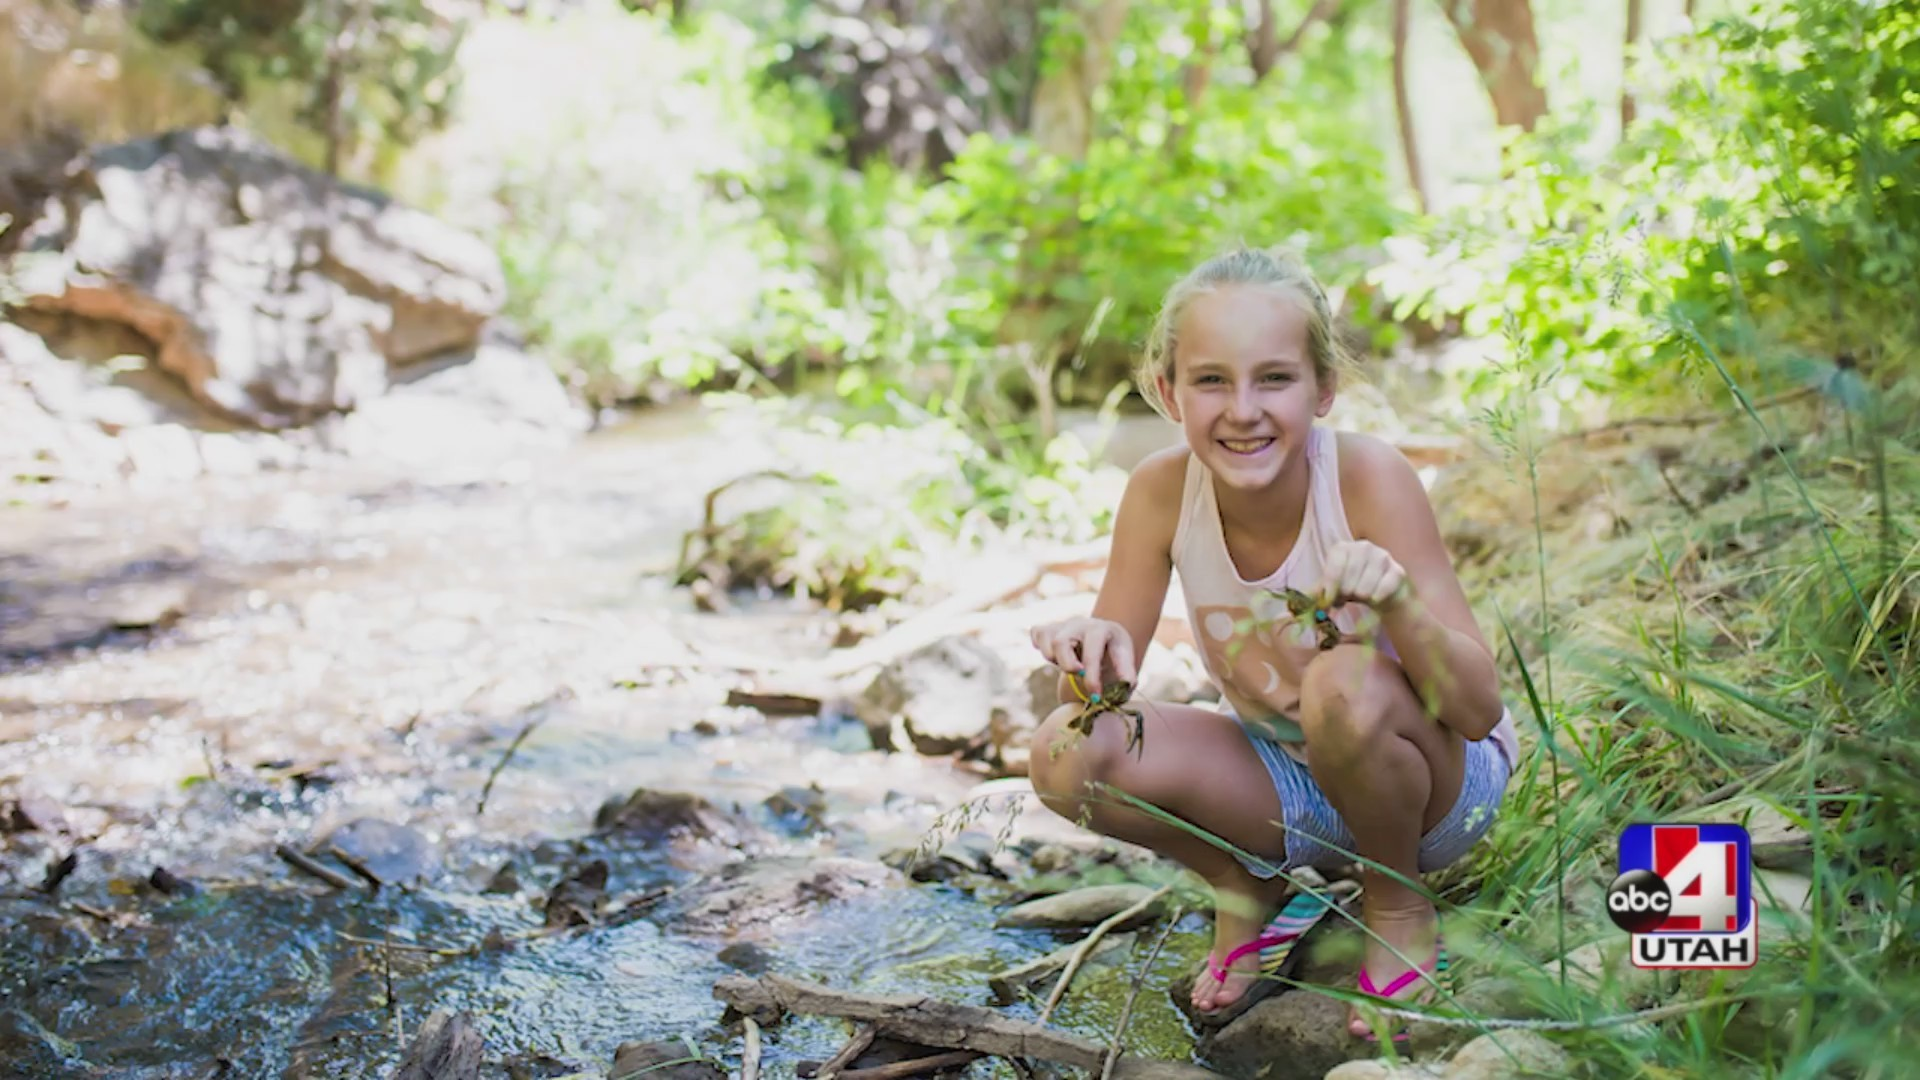 A Look At Veyo Pool & Crawdad Canyon